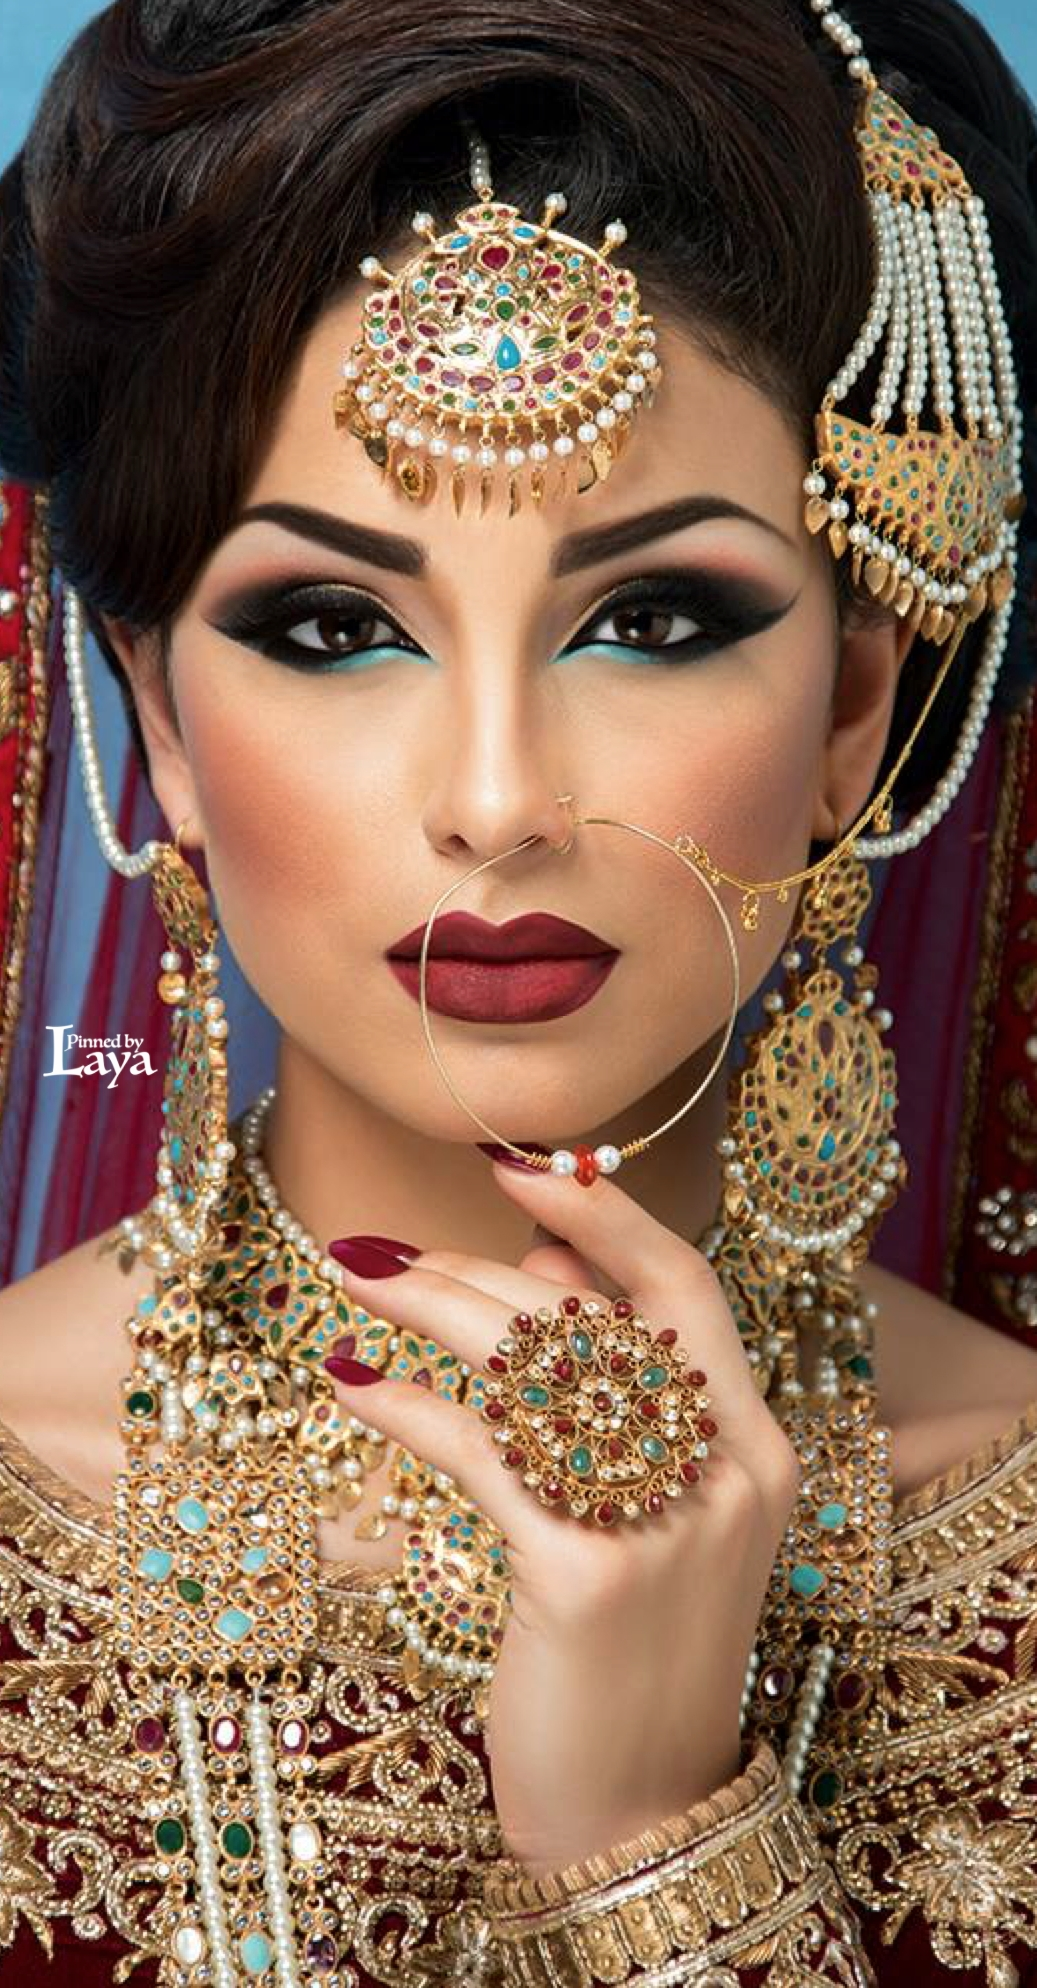 Pin By Label Shrena Hirawat On Beauty, Hair, Makeup | Pinterest with Bridal Makeup Pic Facebook